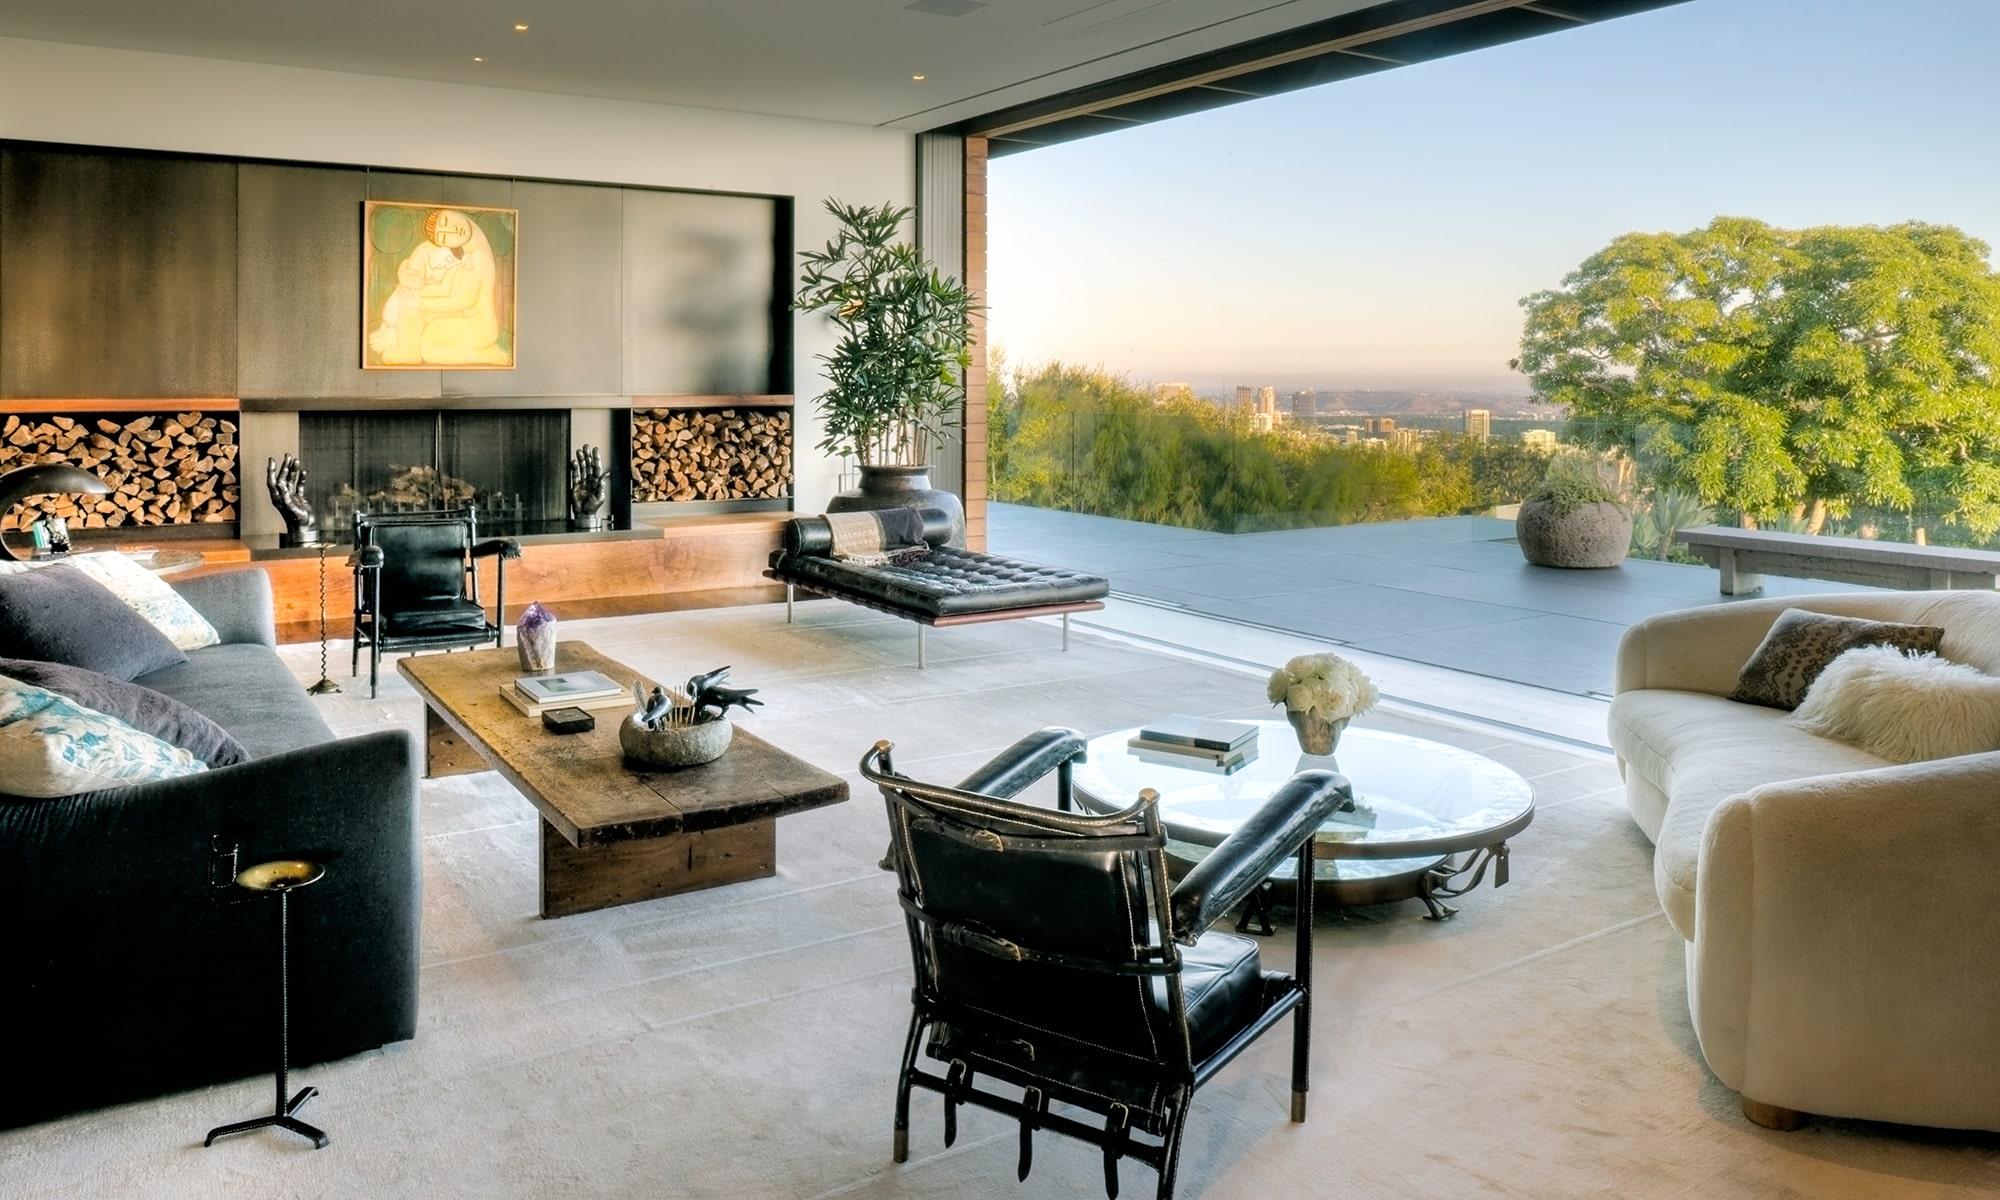 Jennifer Aniston's Bel Air living room, designed by Stephen Shadley